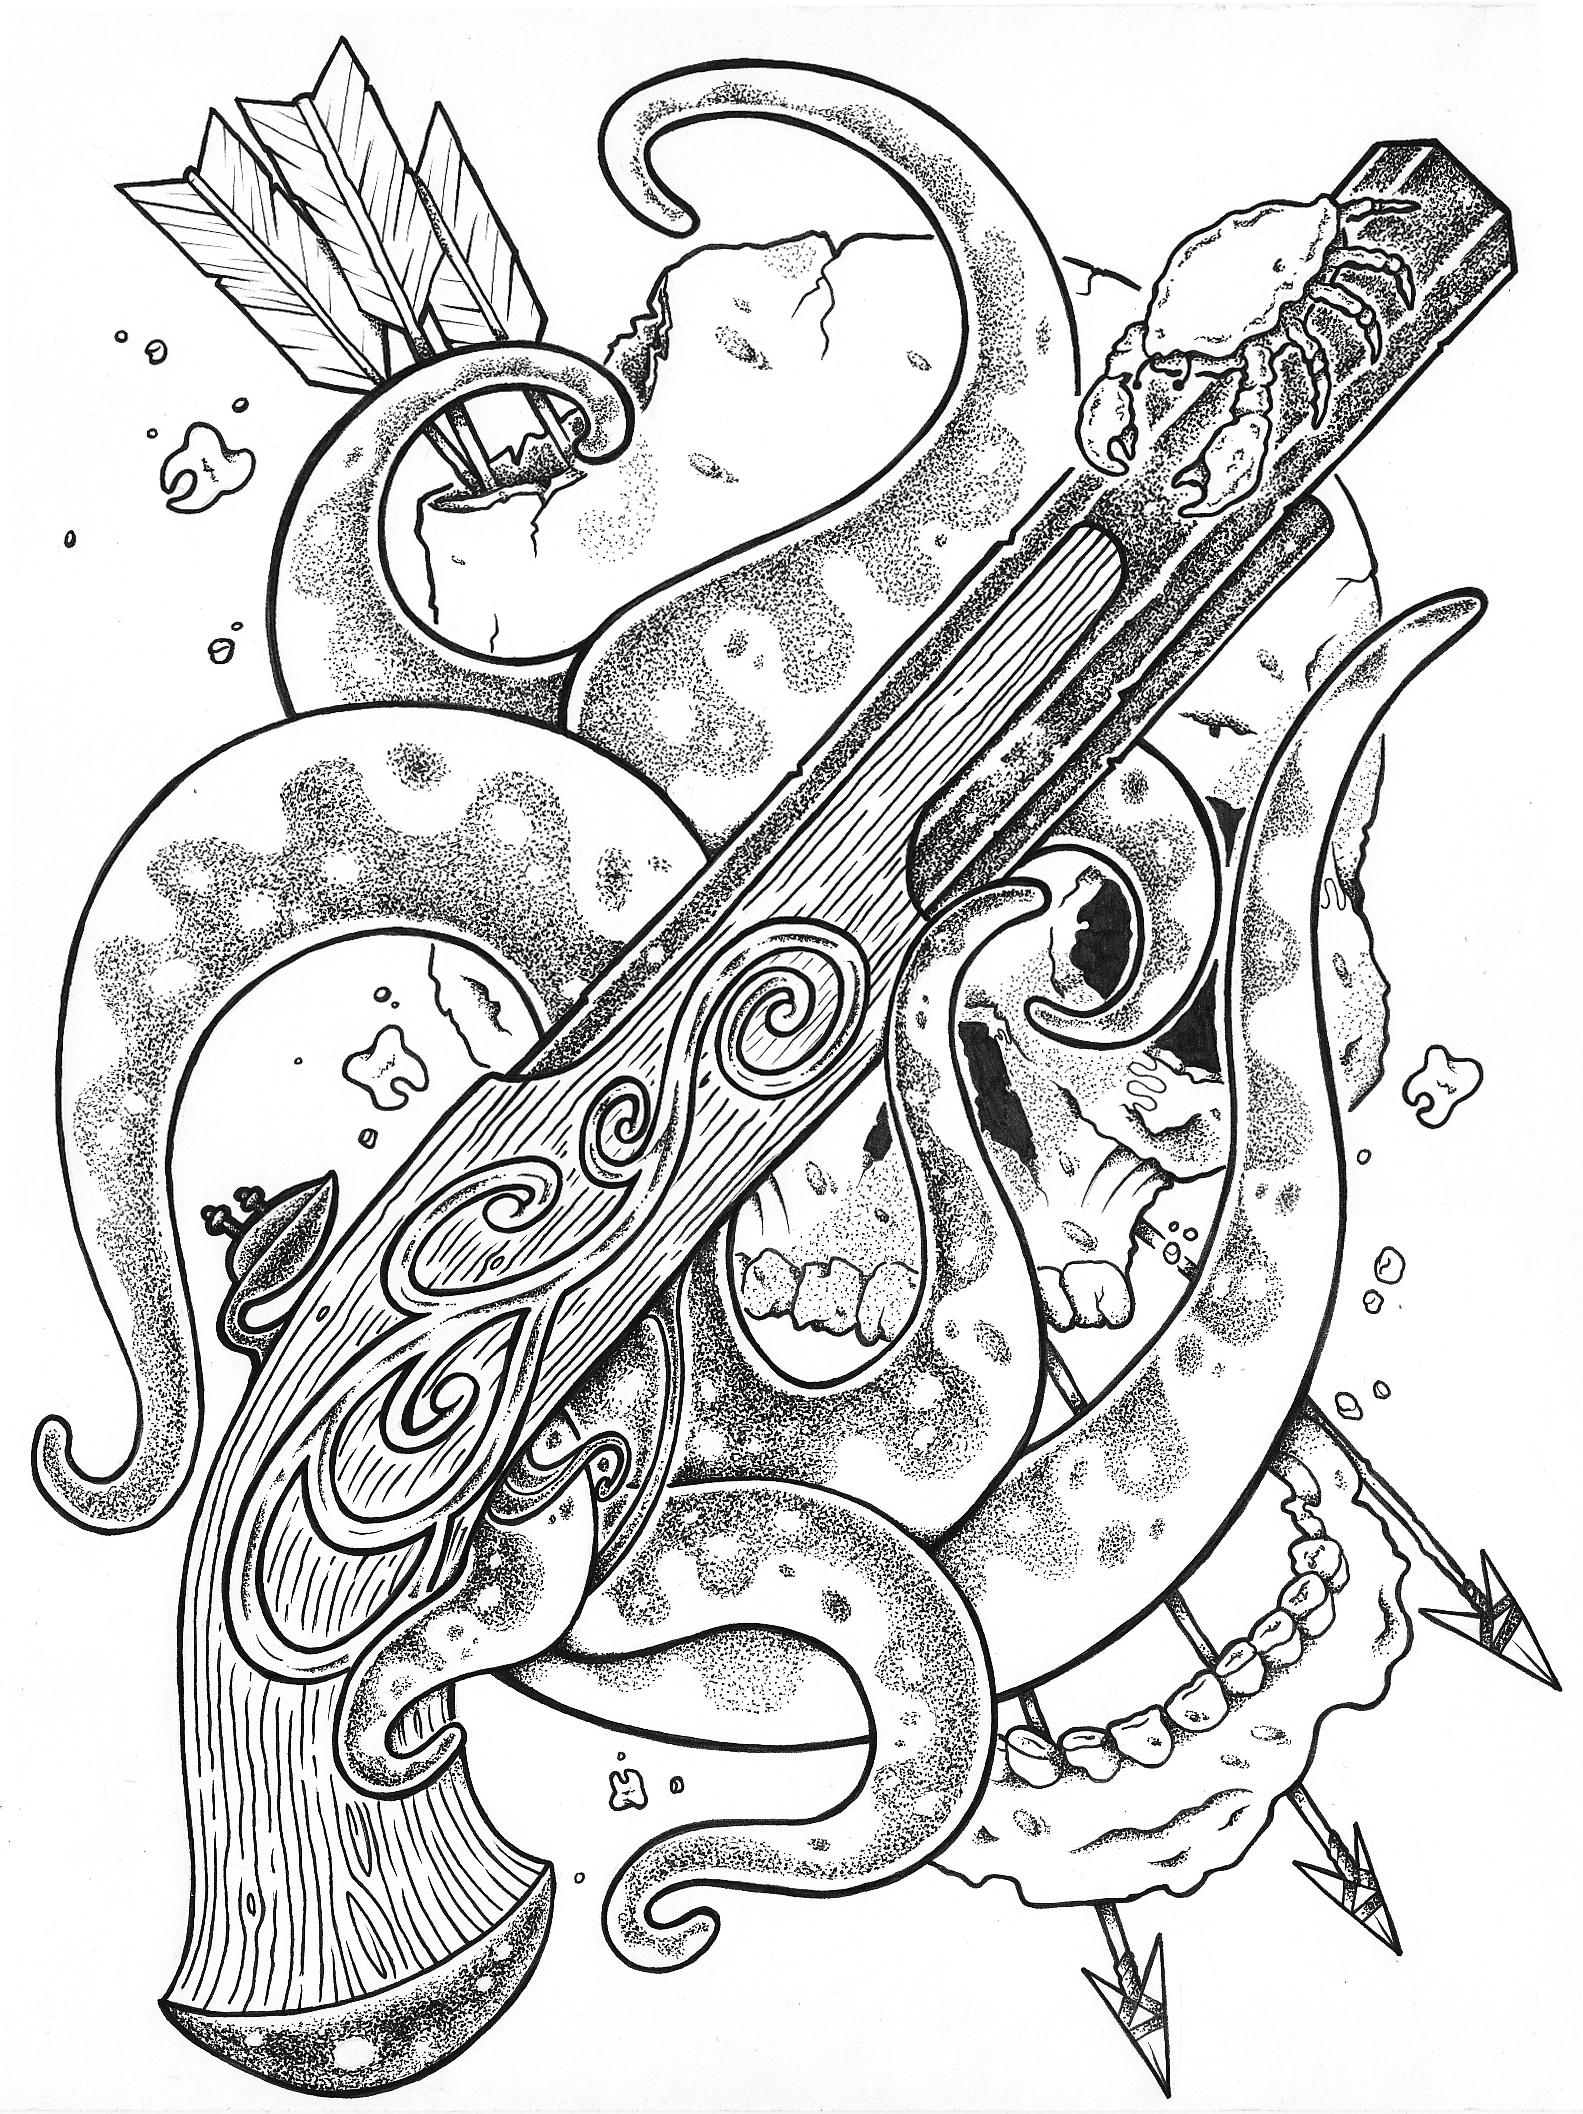 Pirate Compass Rose Sketch Coloring Page Gamer Sugar Skull Free Printable